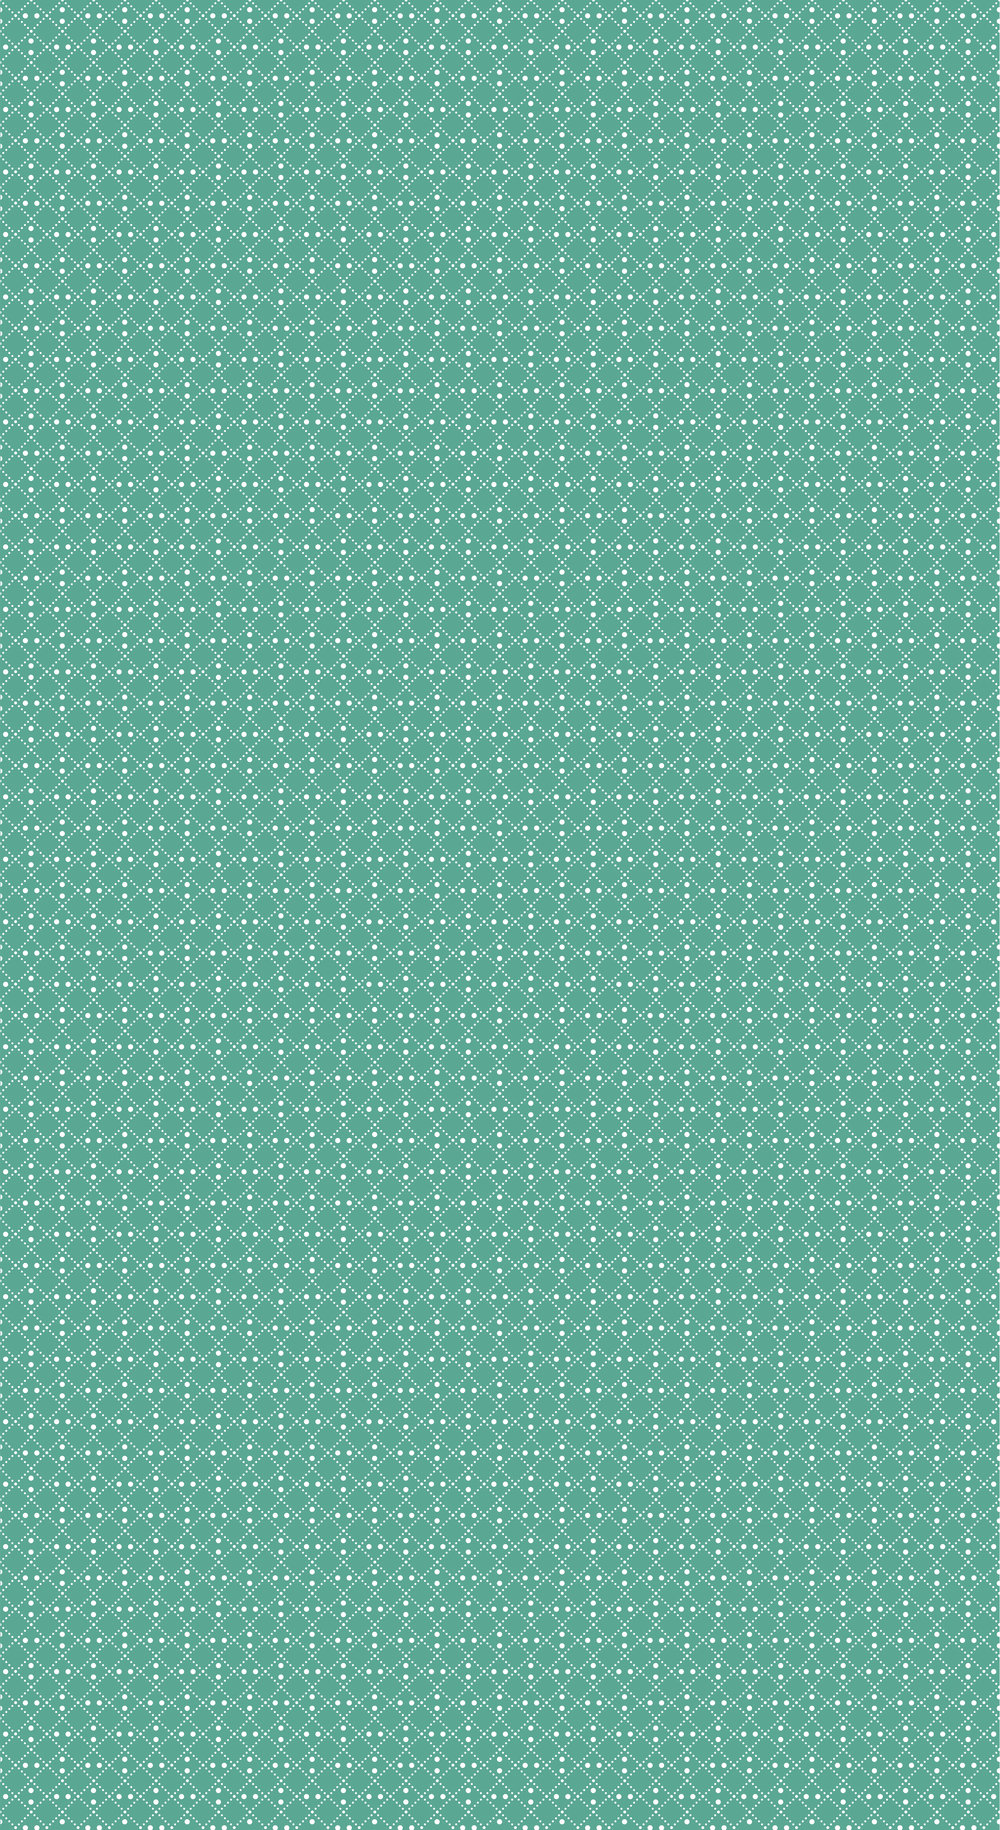 3526-001 PLOTTING-SKY